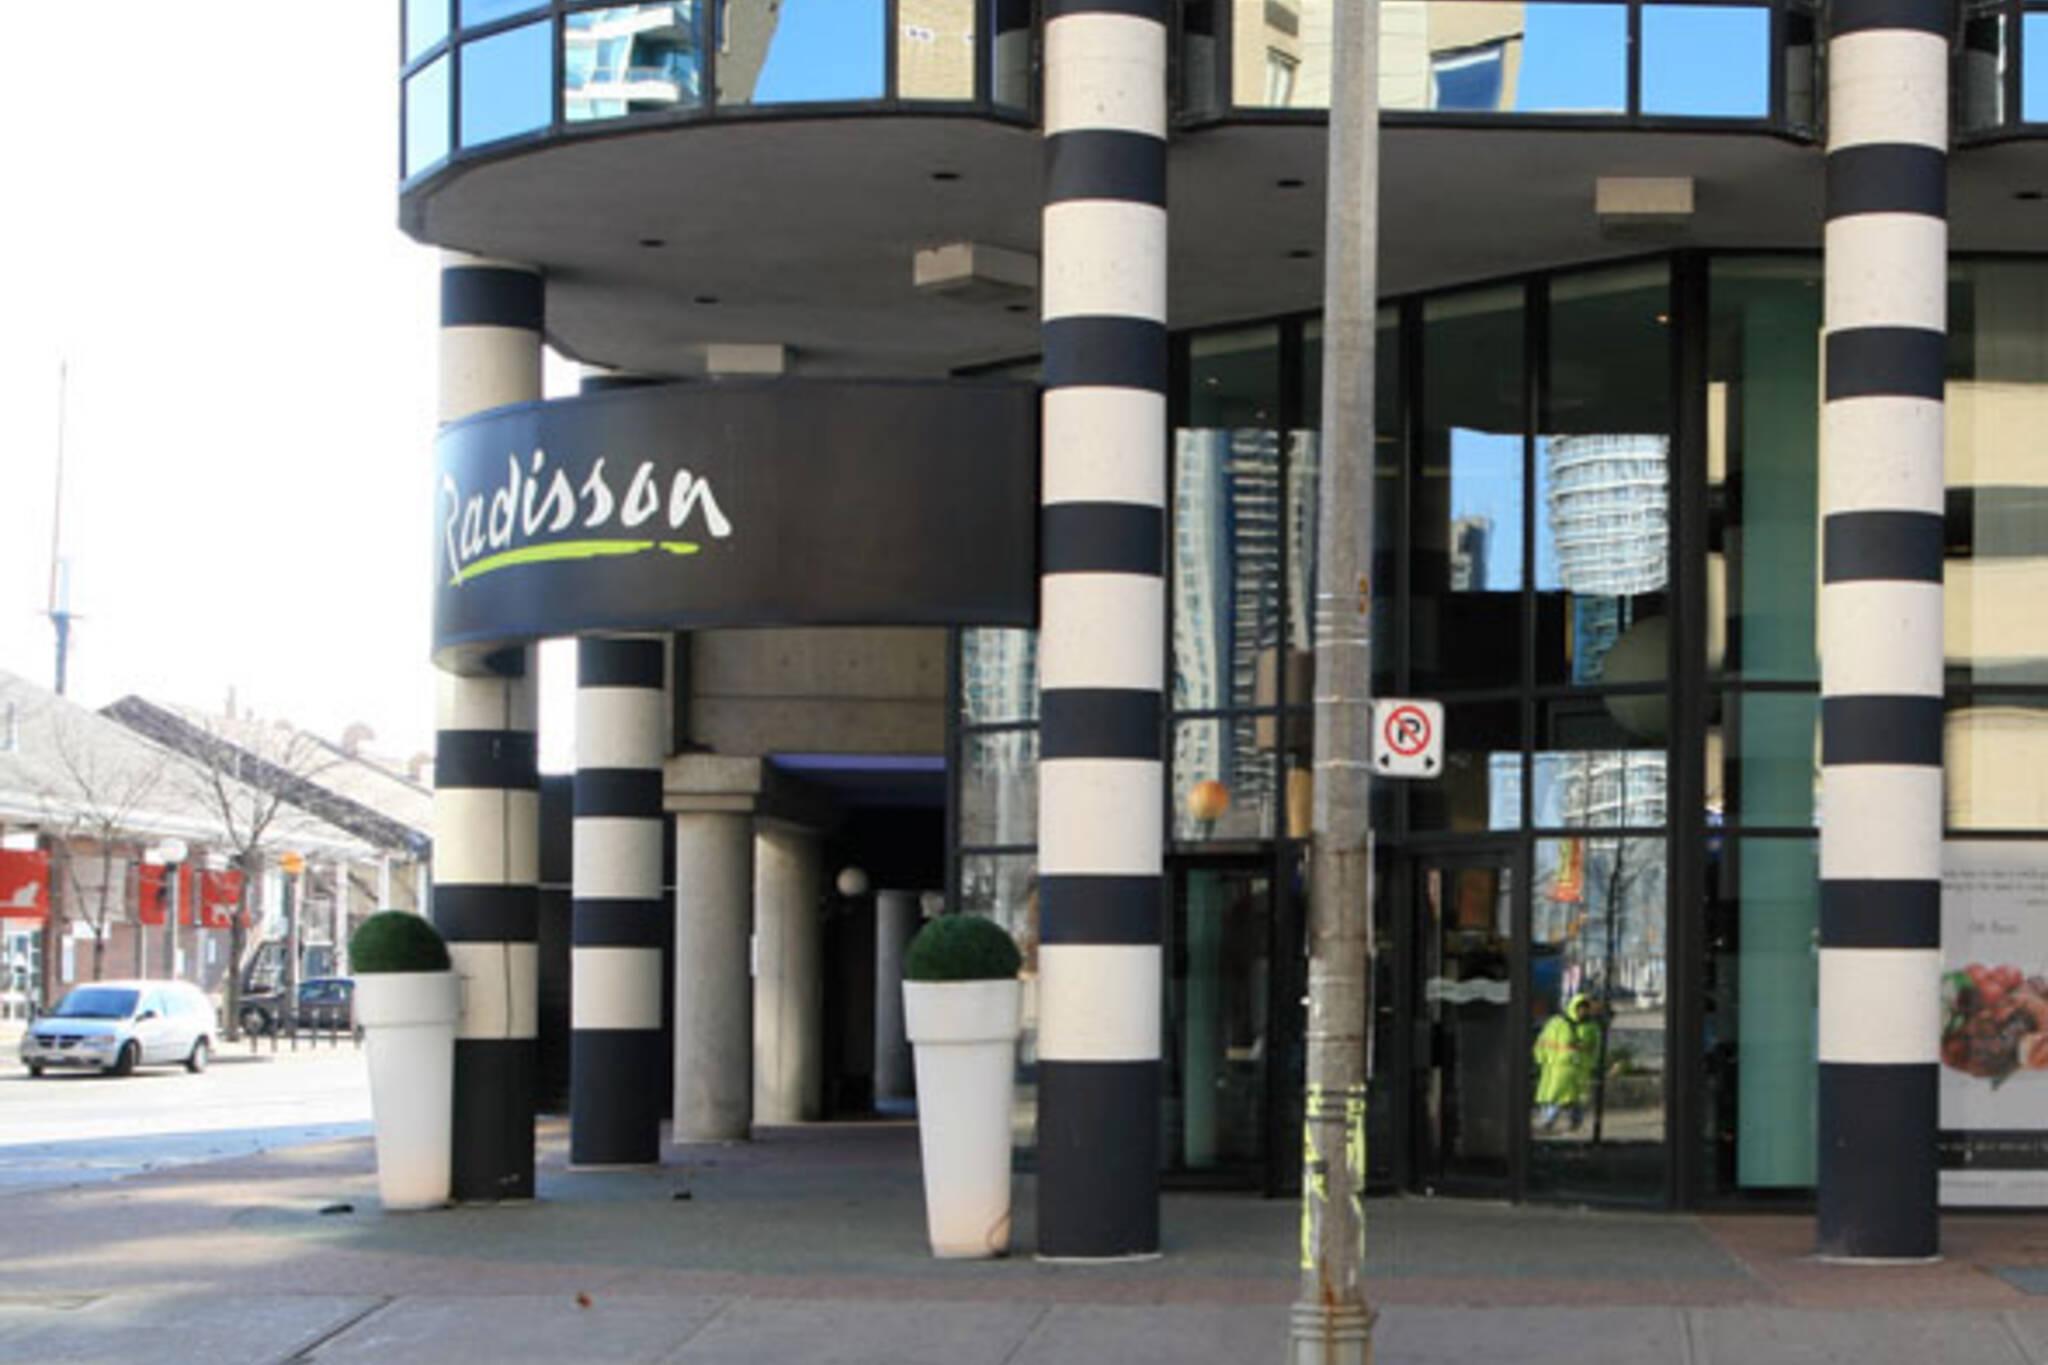 Radisson Hotel Toronto